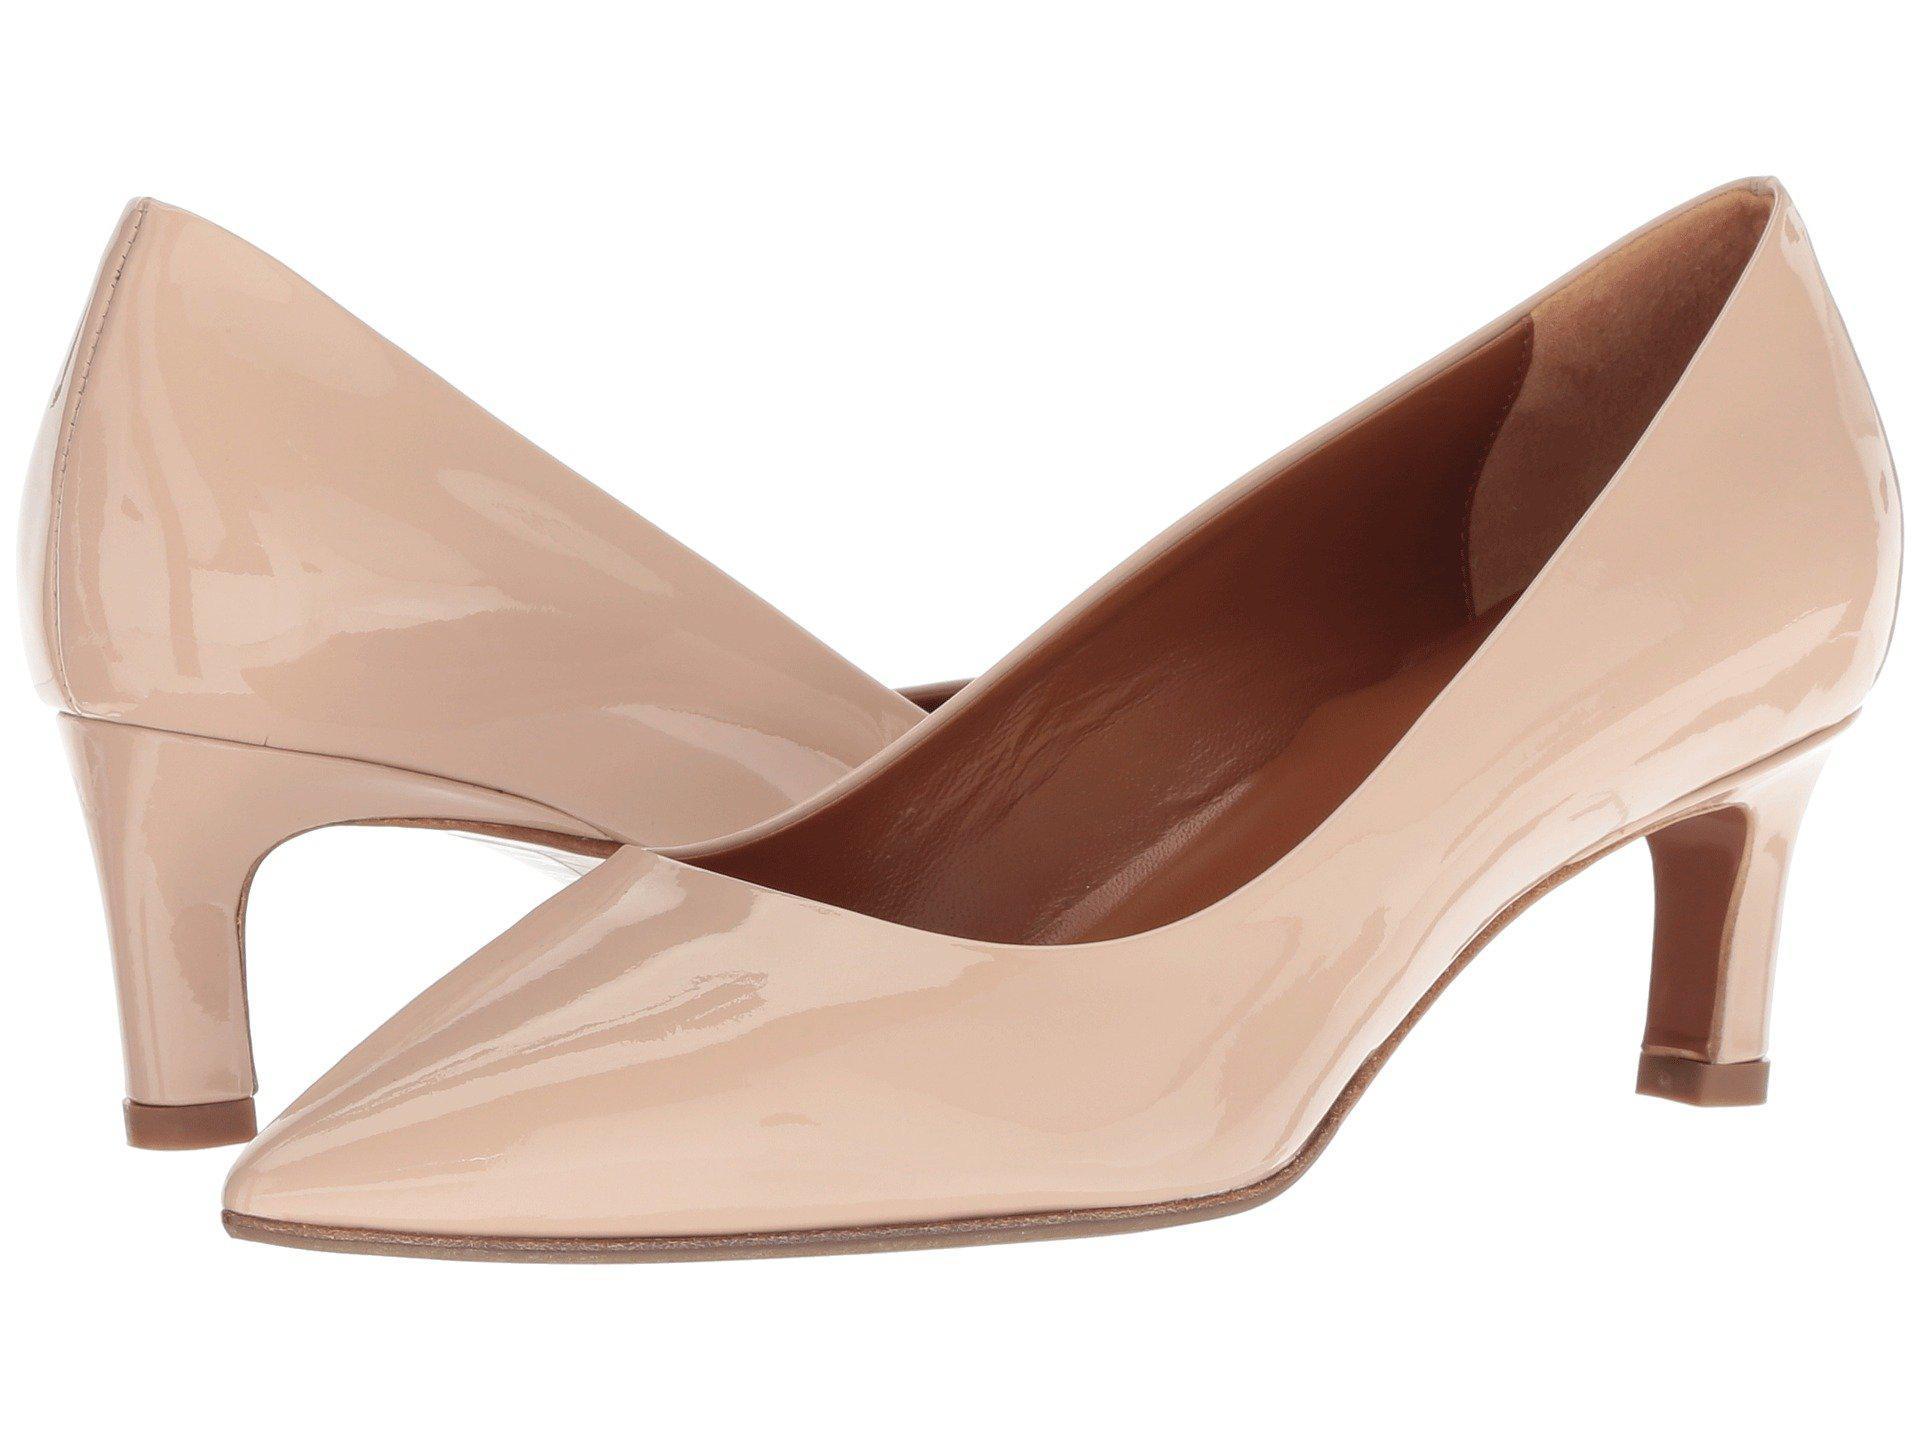 1214101039d1 Lyst - Aquatalia Marianna (black Patent) Women s 1-2 Inch Heel Shoes